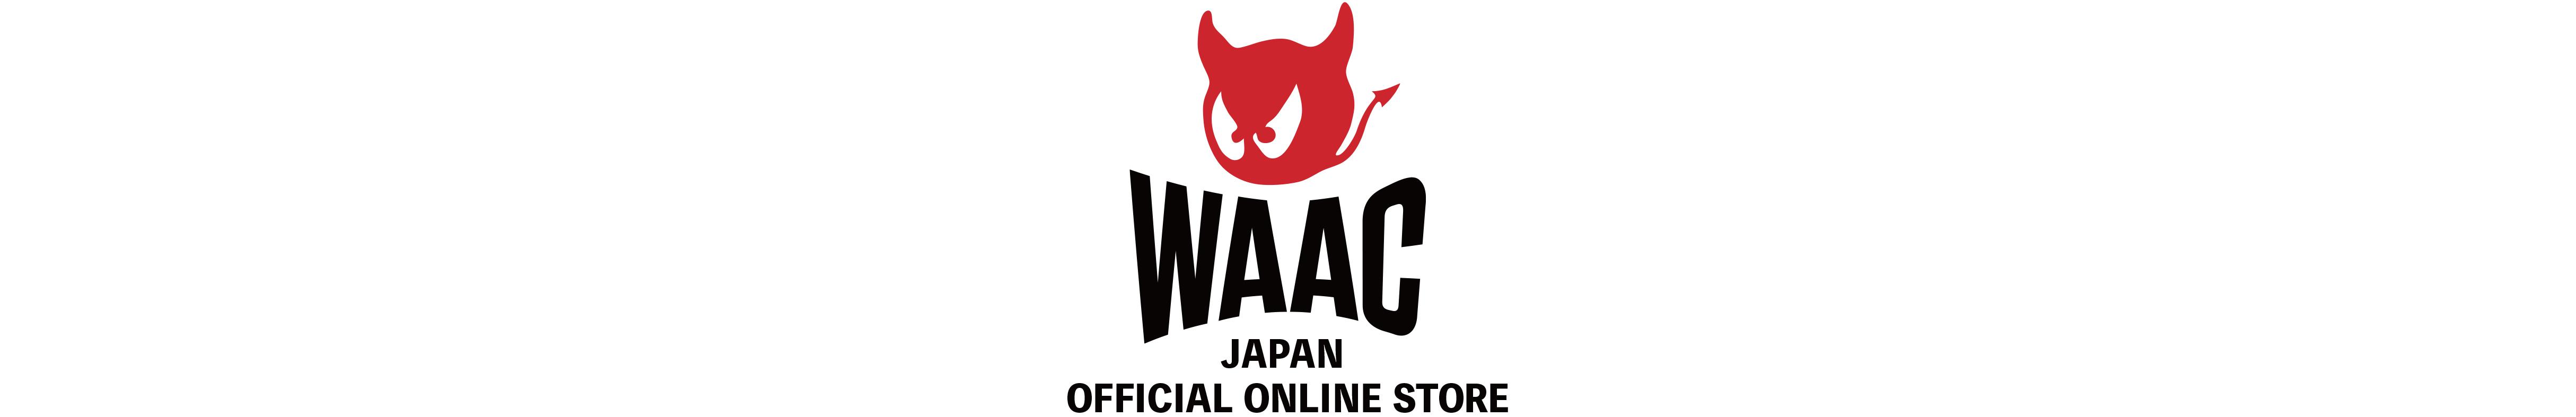 WAAC JAPAN公式オンラインストア